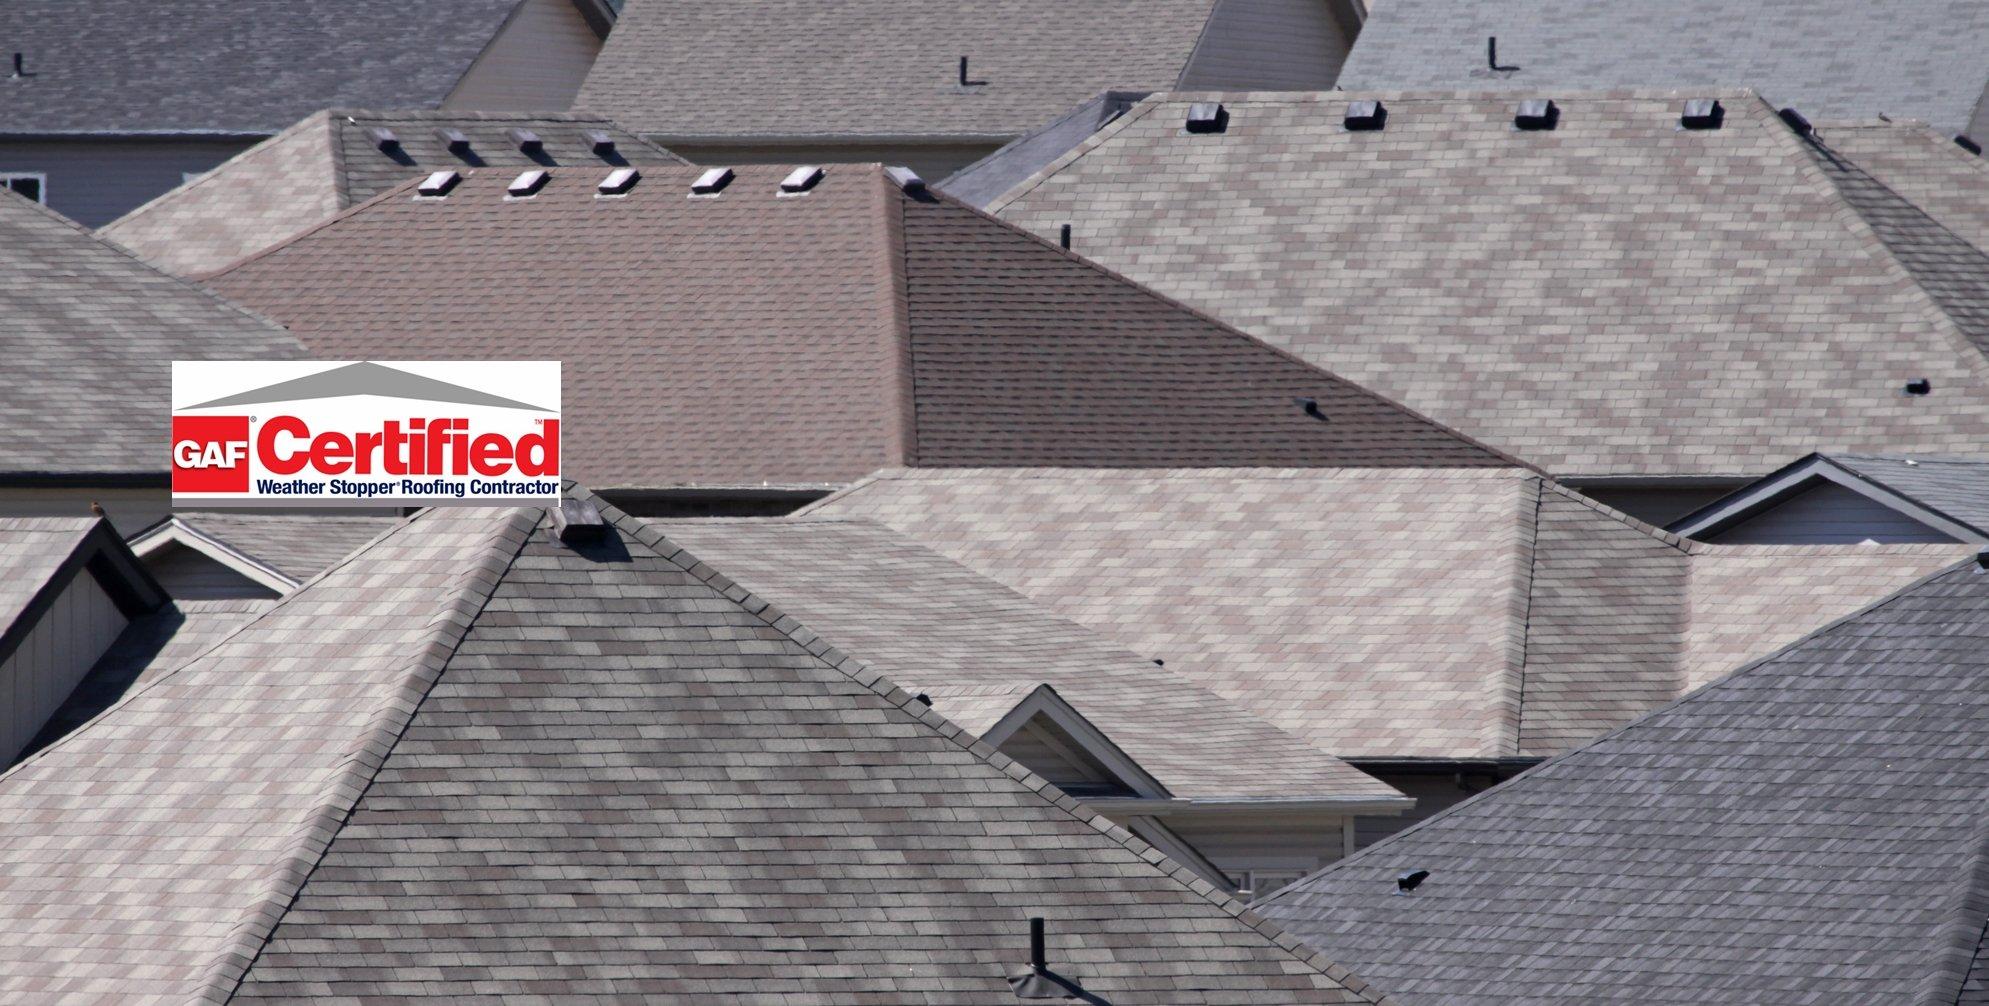 hamilton roofers